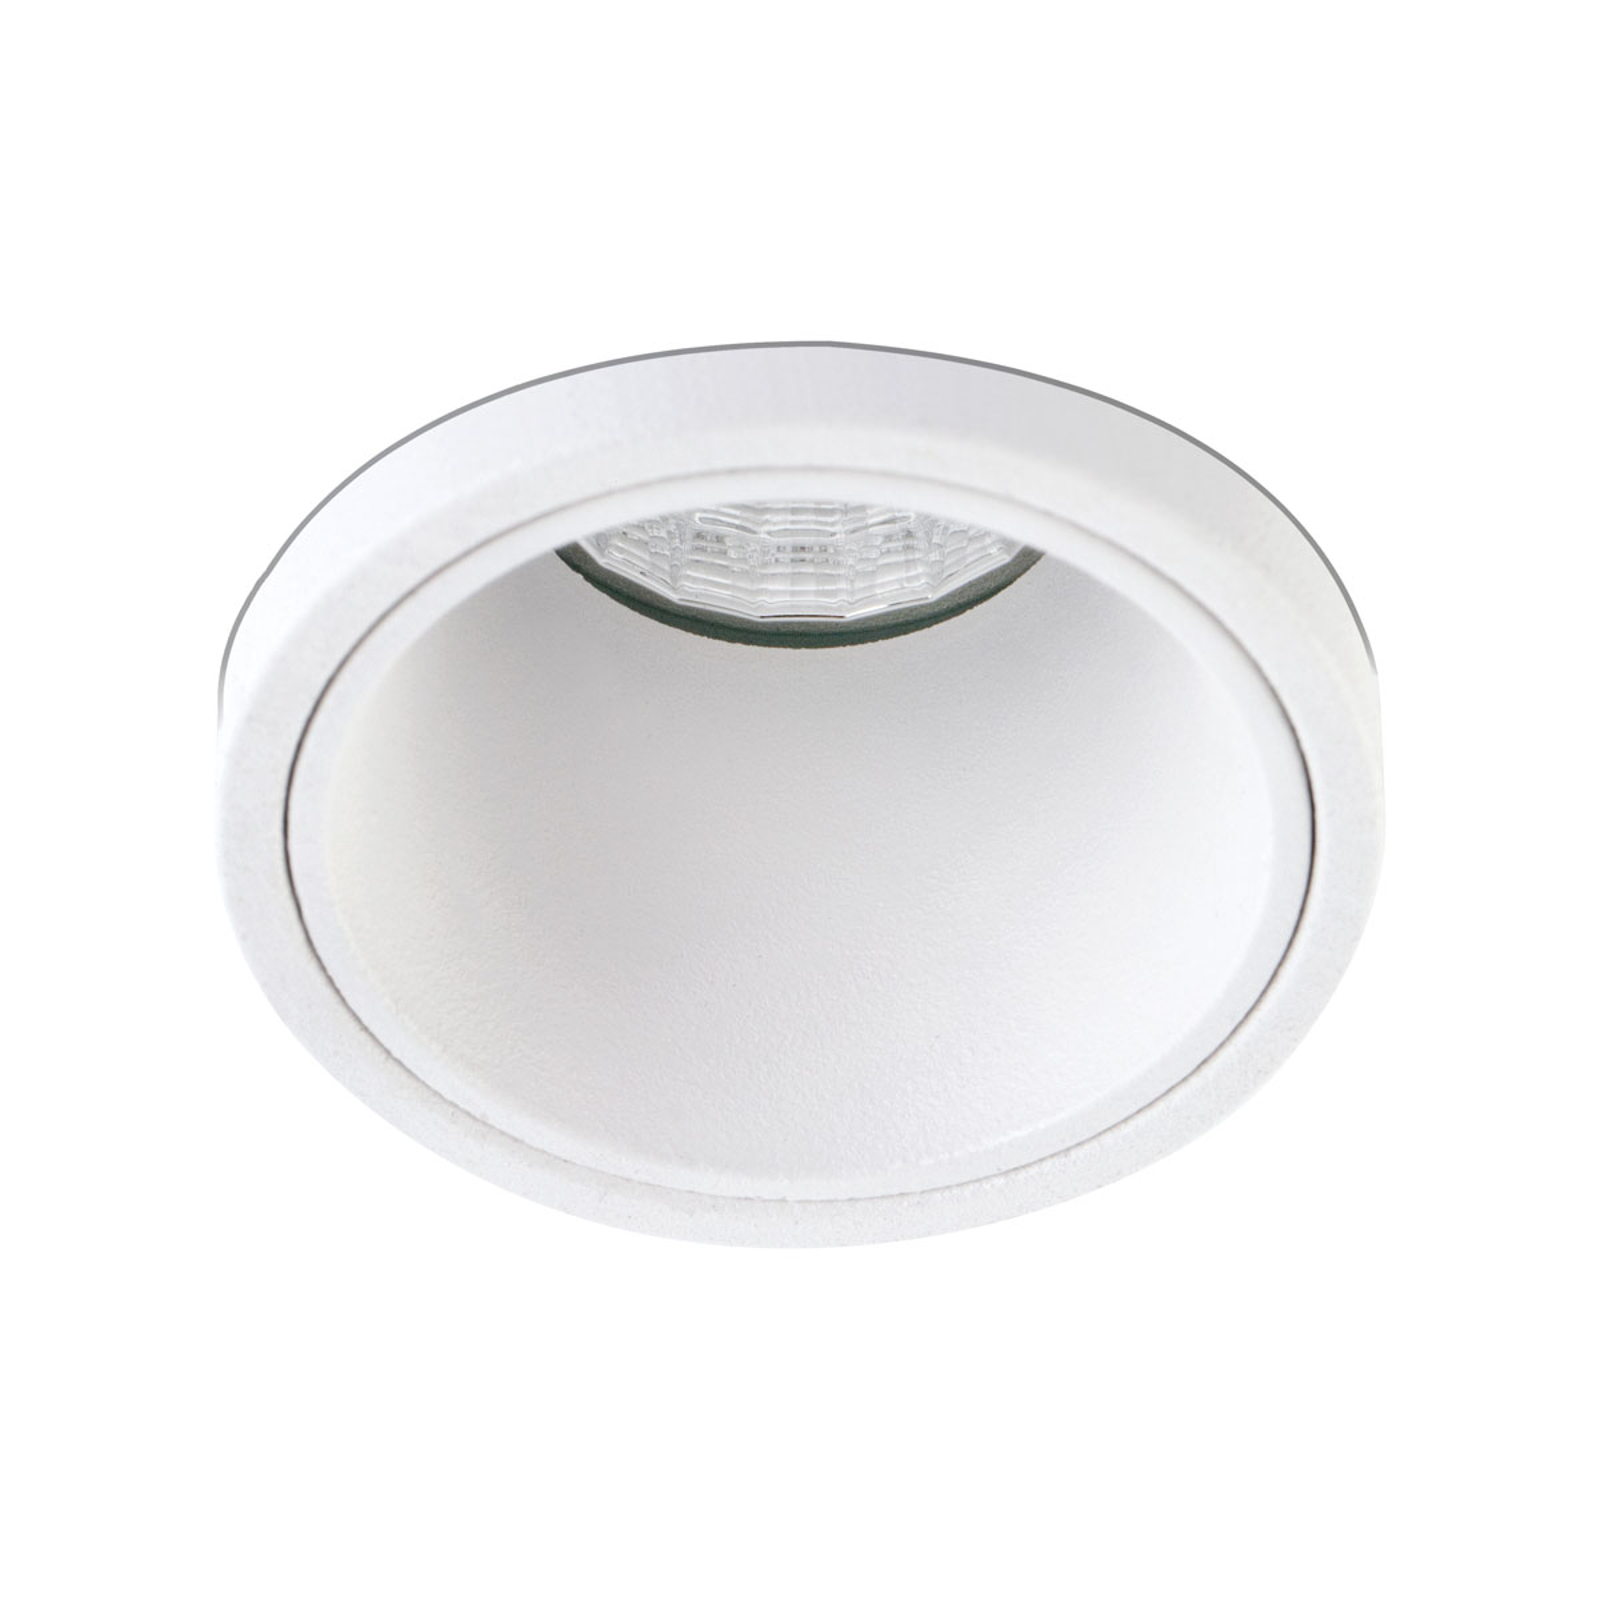 LED-Downlight Fox Trimless, dimmbar